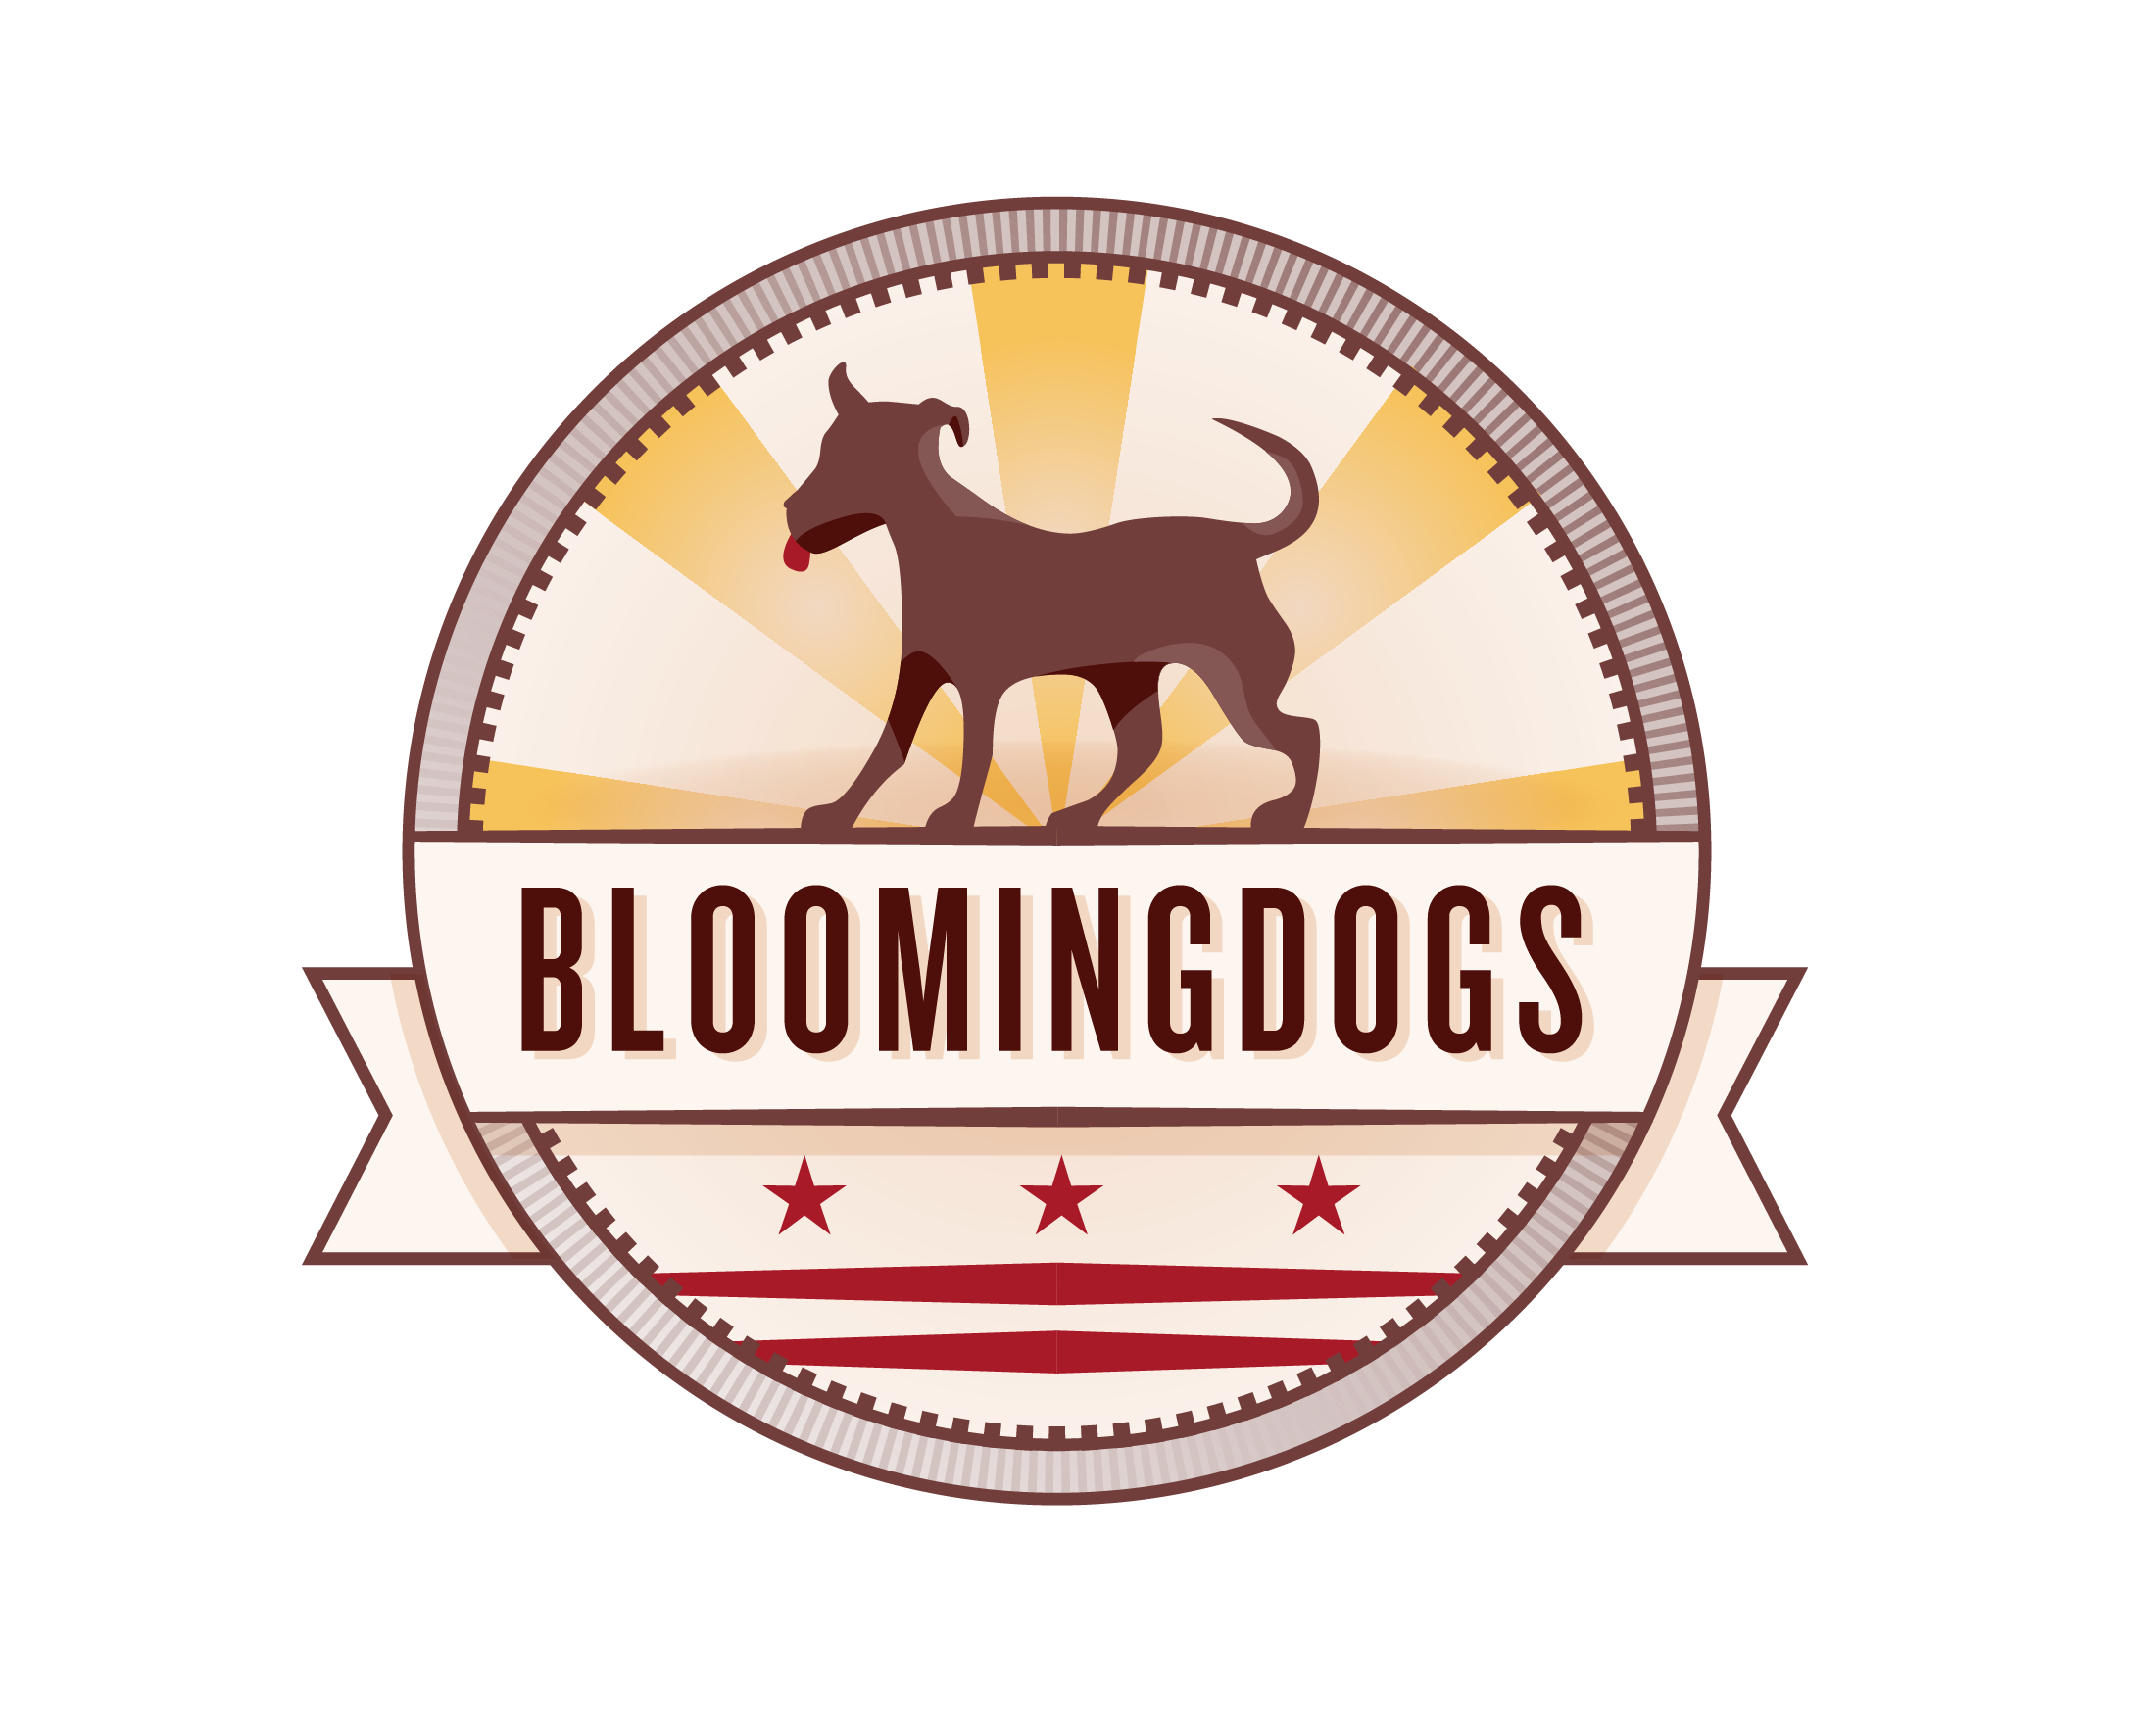 Bloomingdogs logo